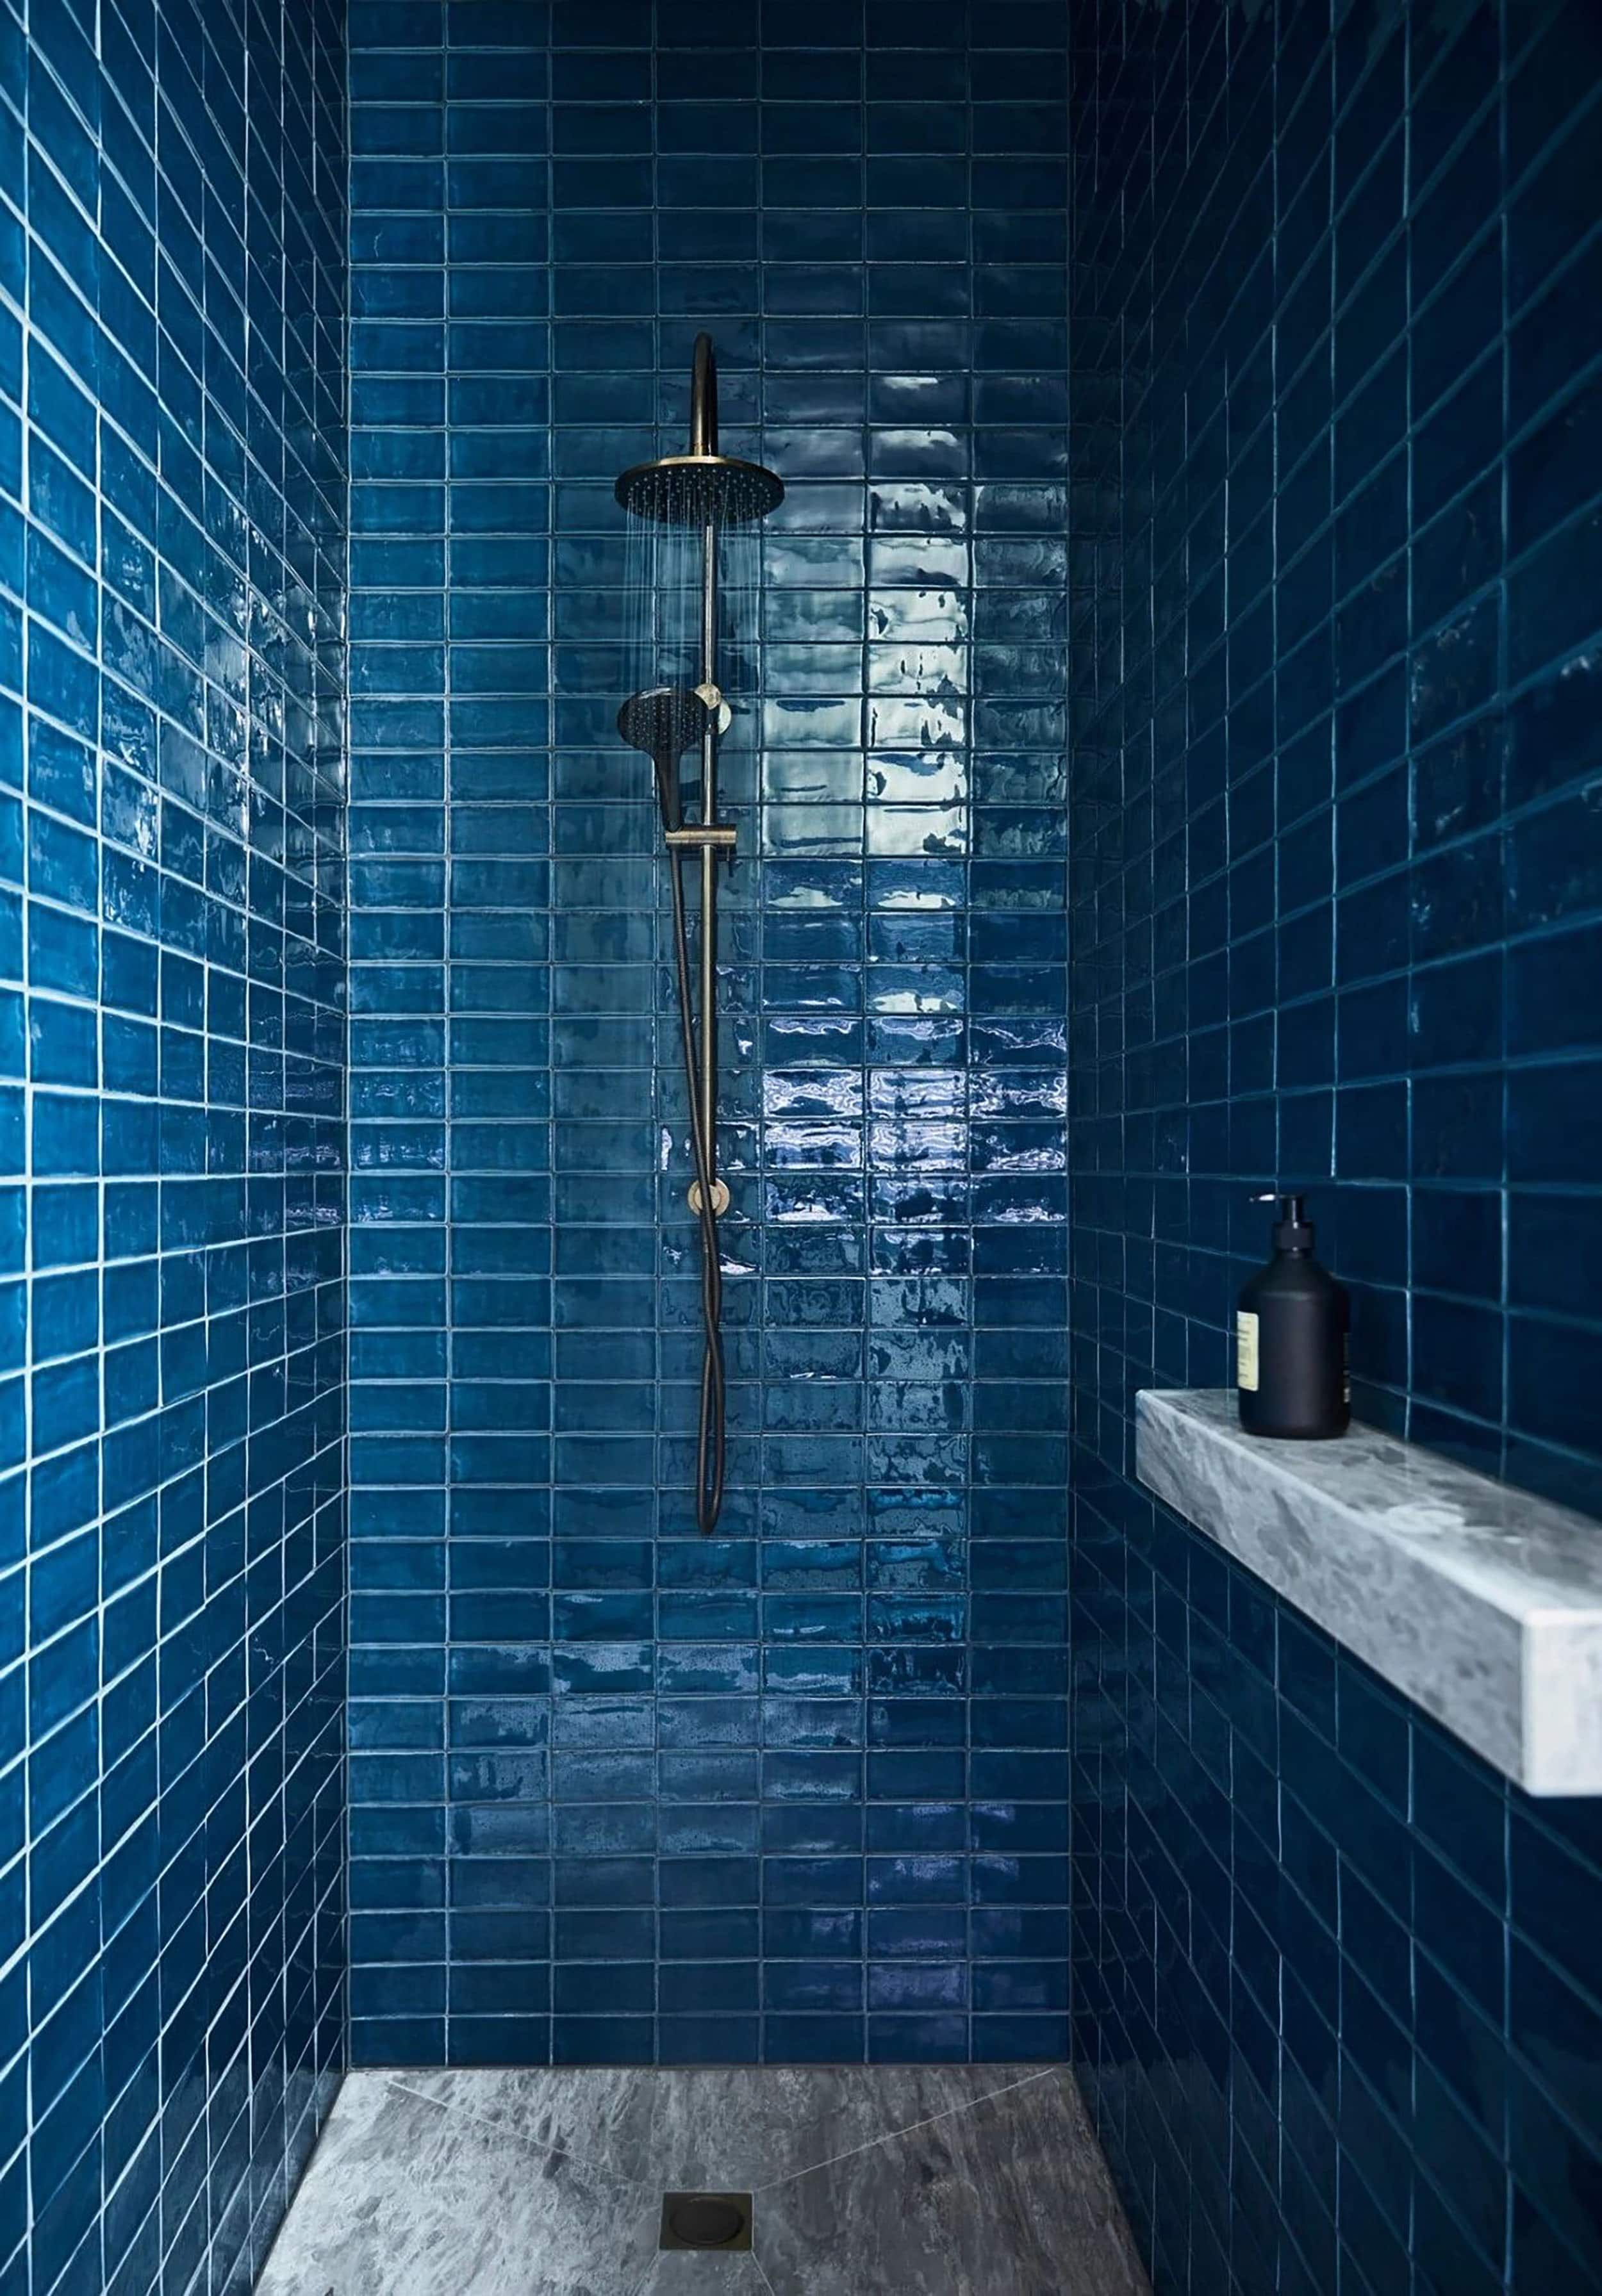 The 9 Best 2020 Bathroom Trends We Wish We Had Right Now Emily Henderson Bathroom Trends Tile Bathroom 2020 Bathroom Trends